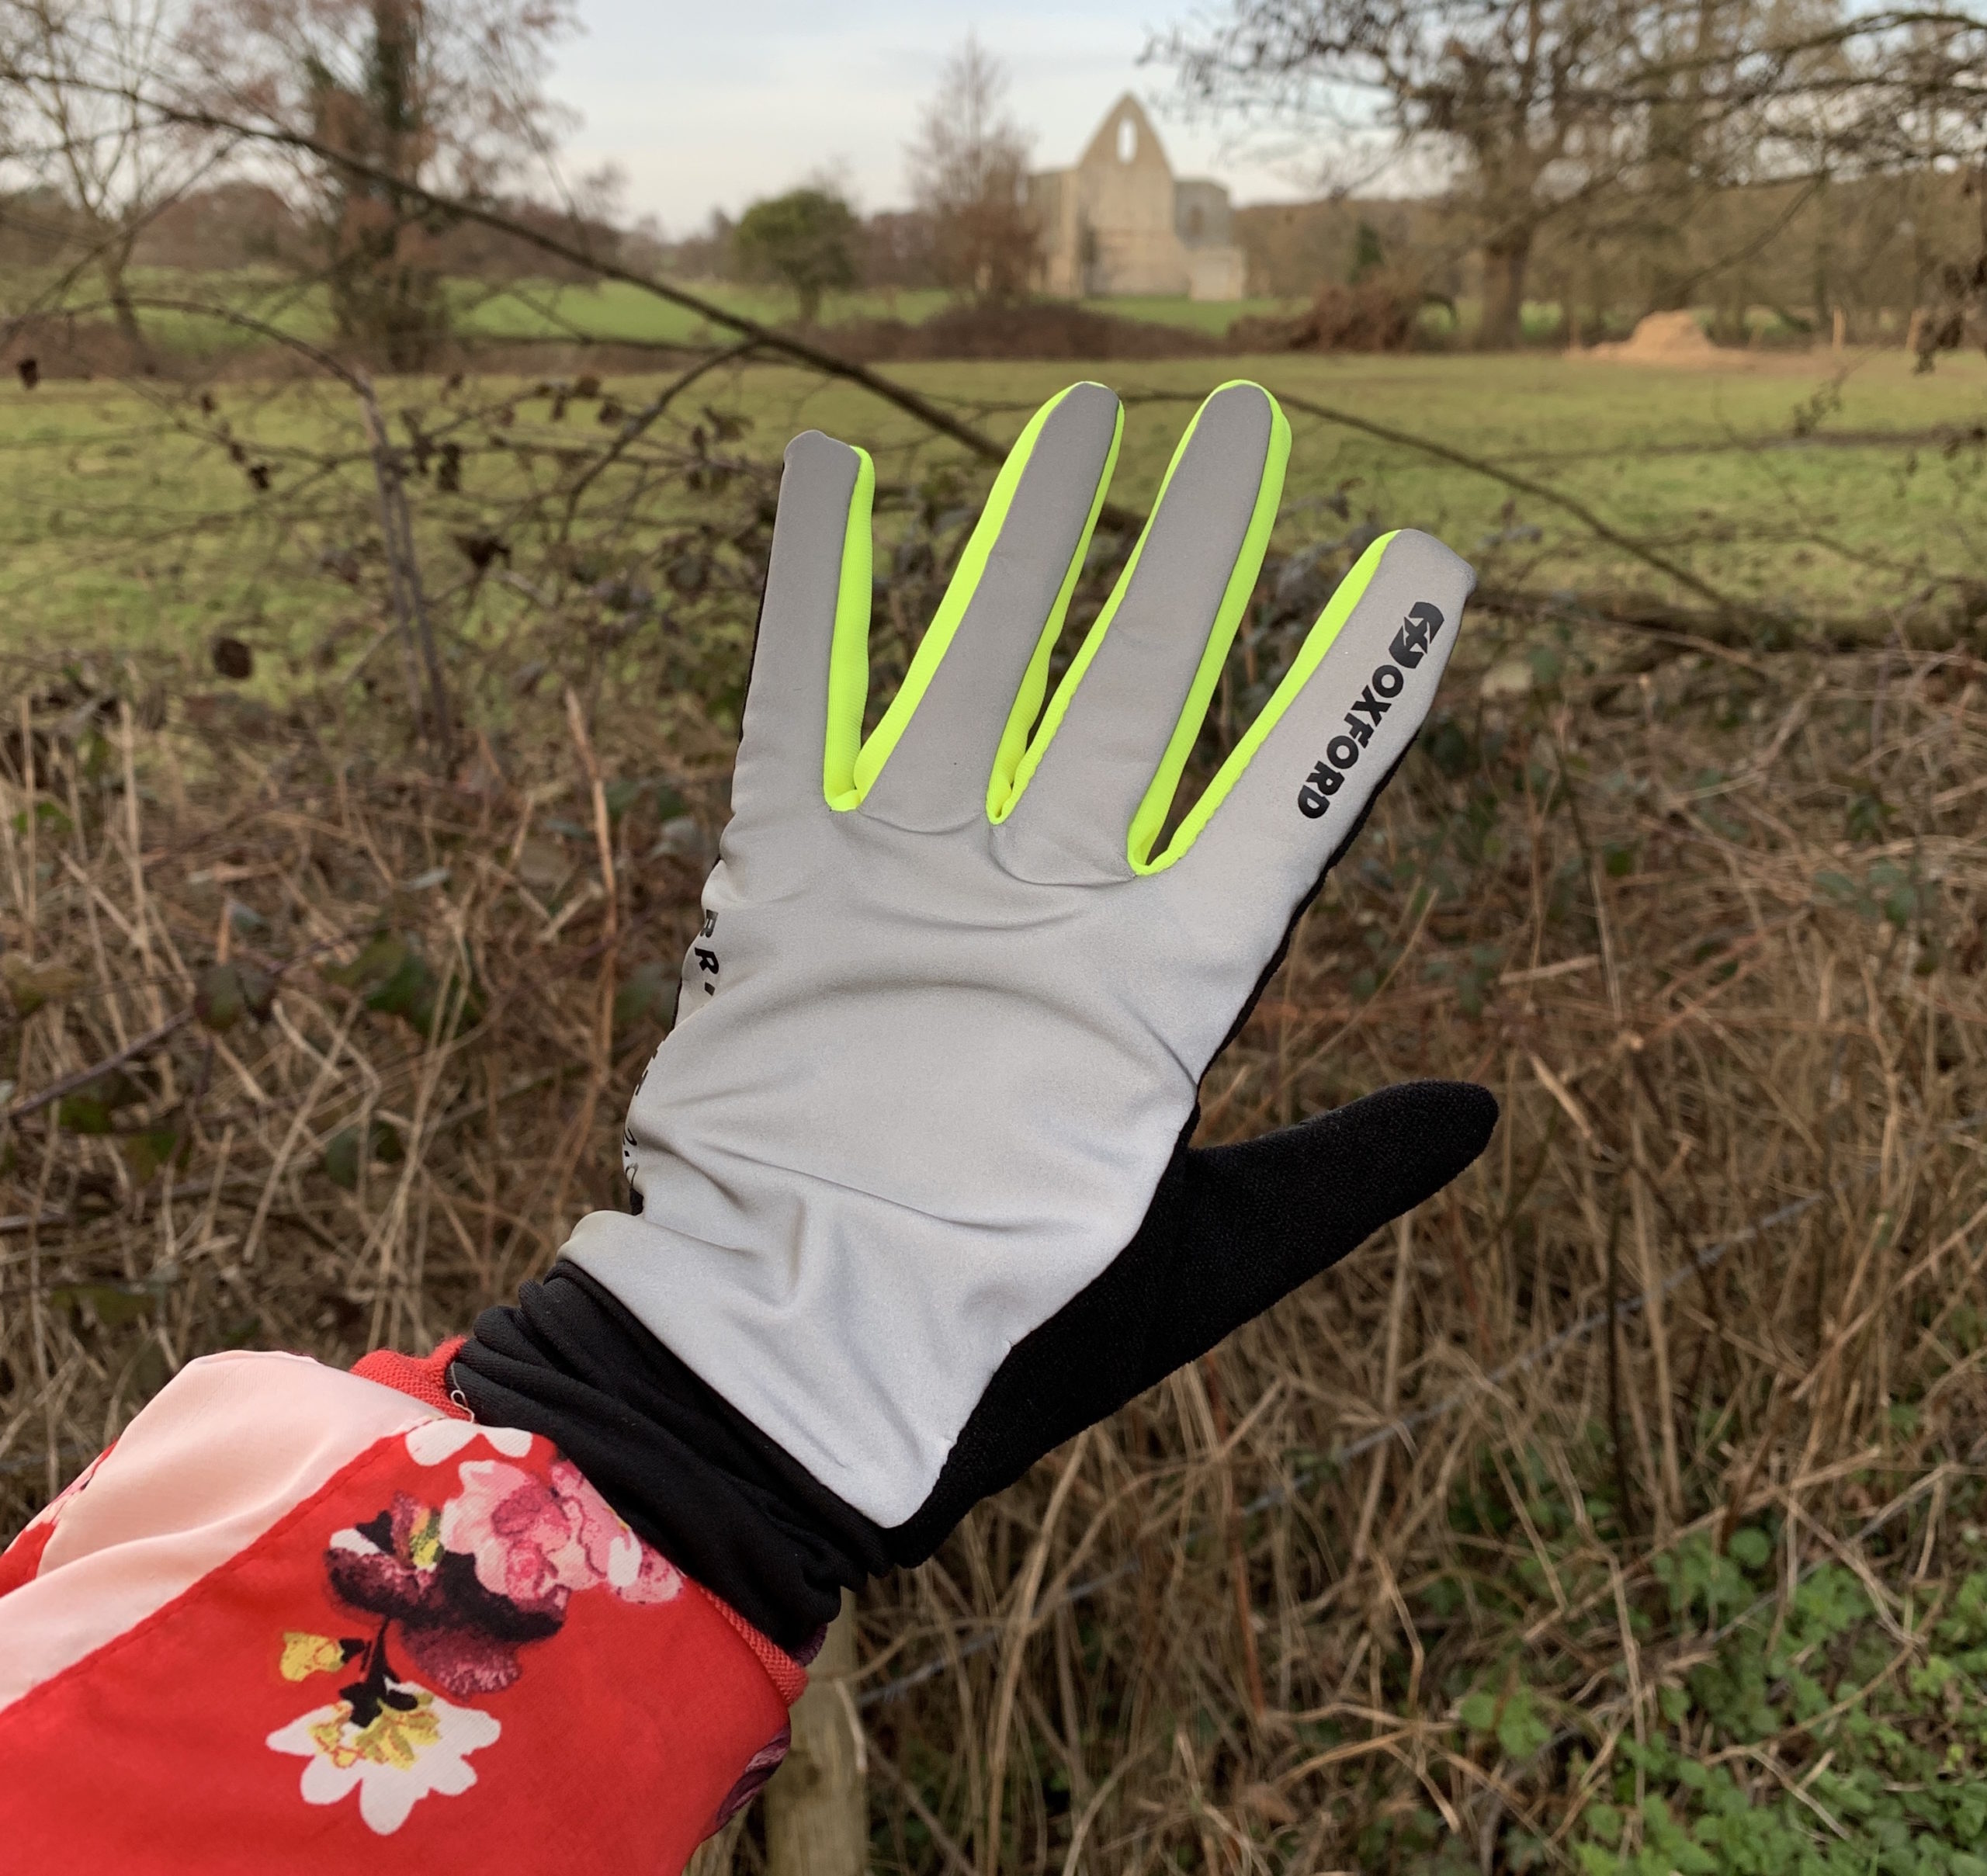 Oxford Bright Gloves 2.0